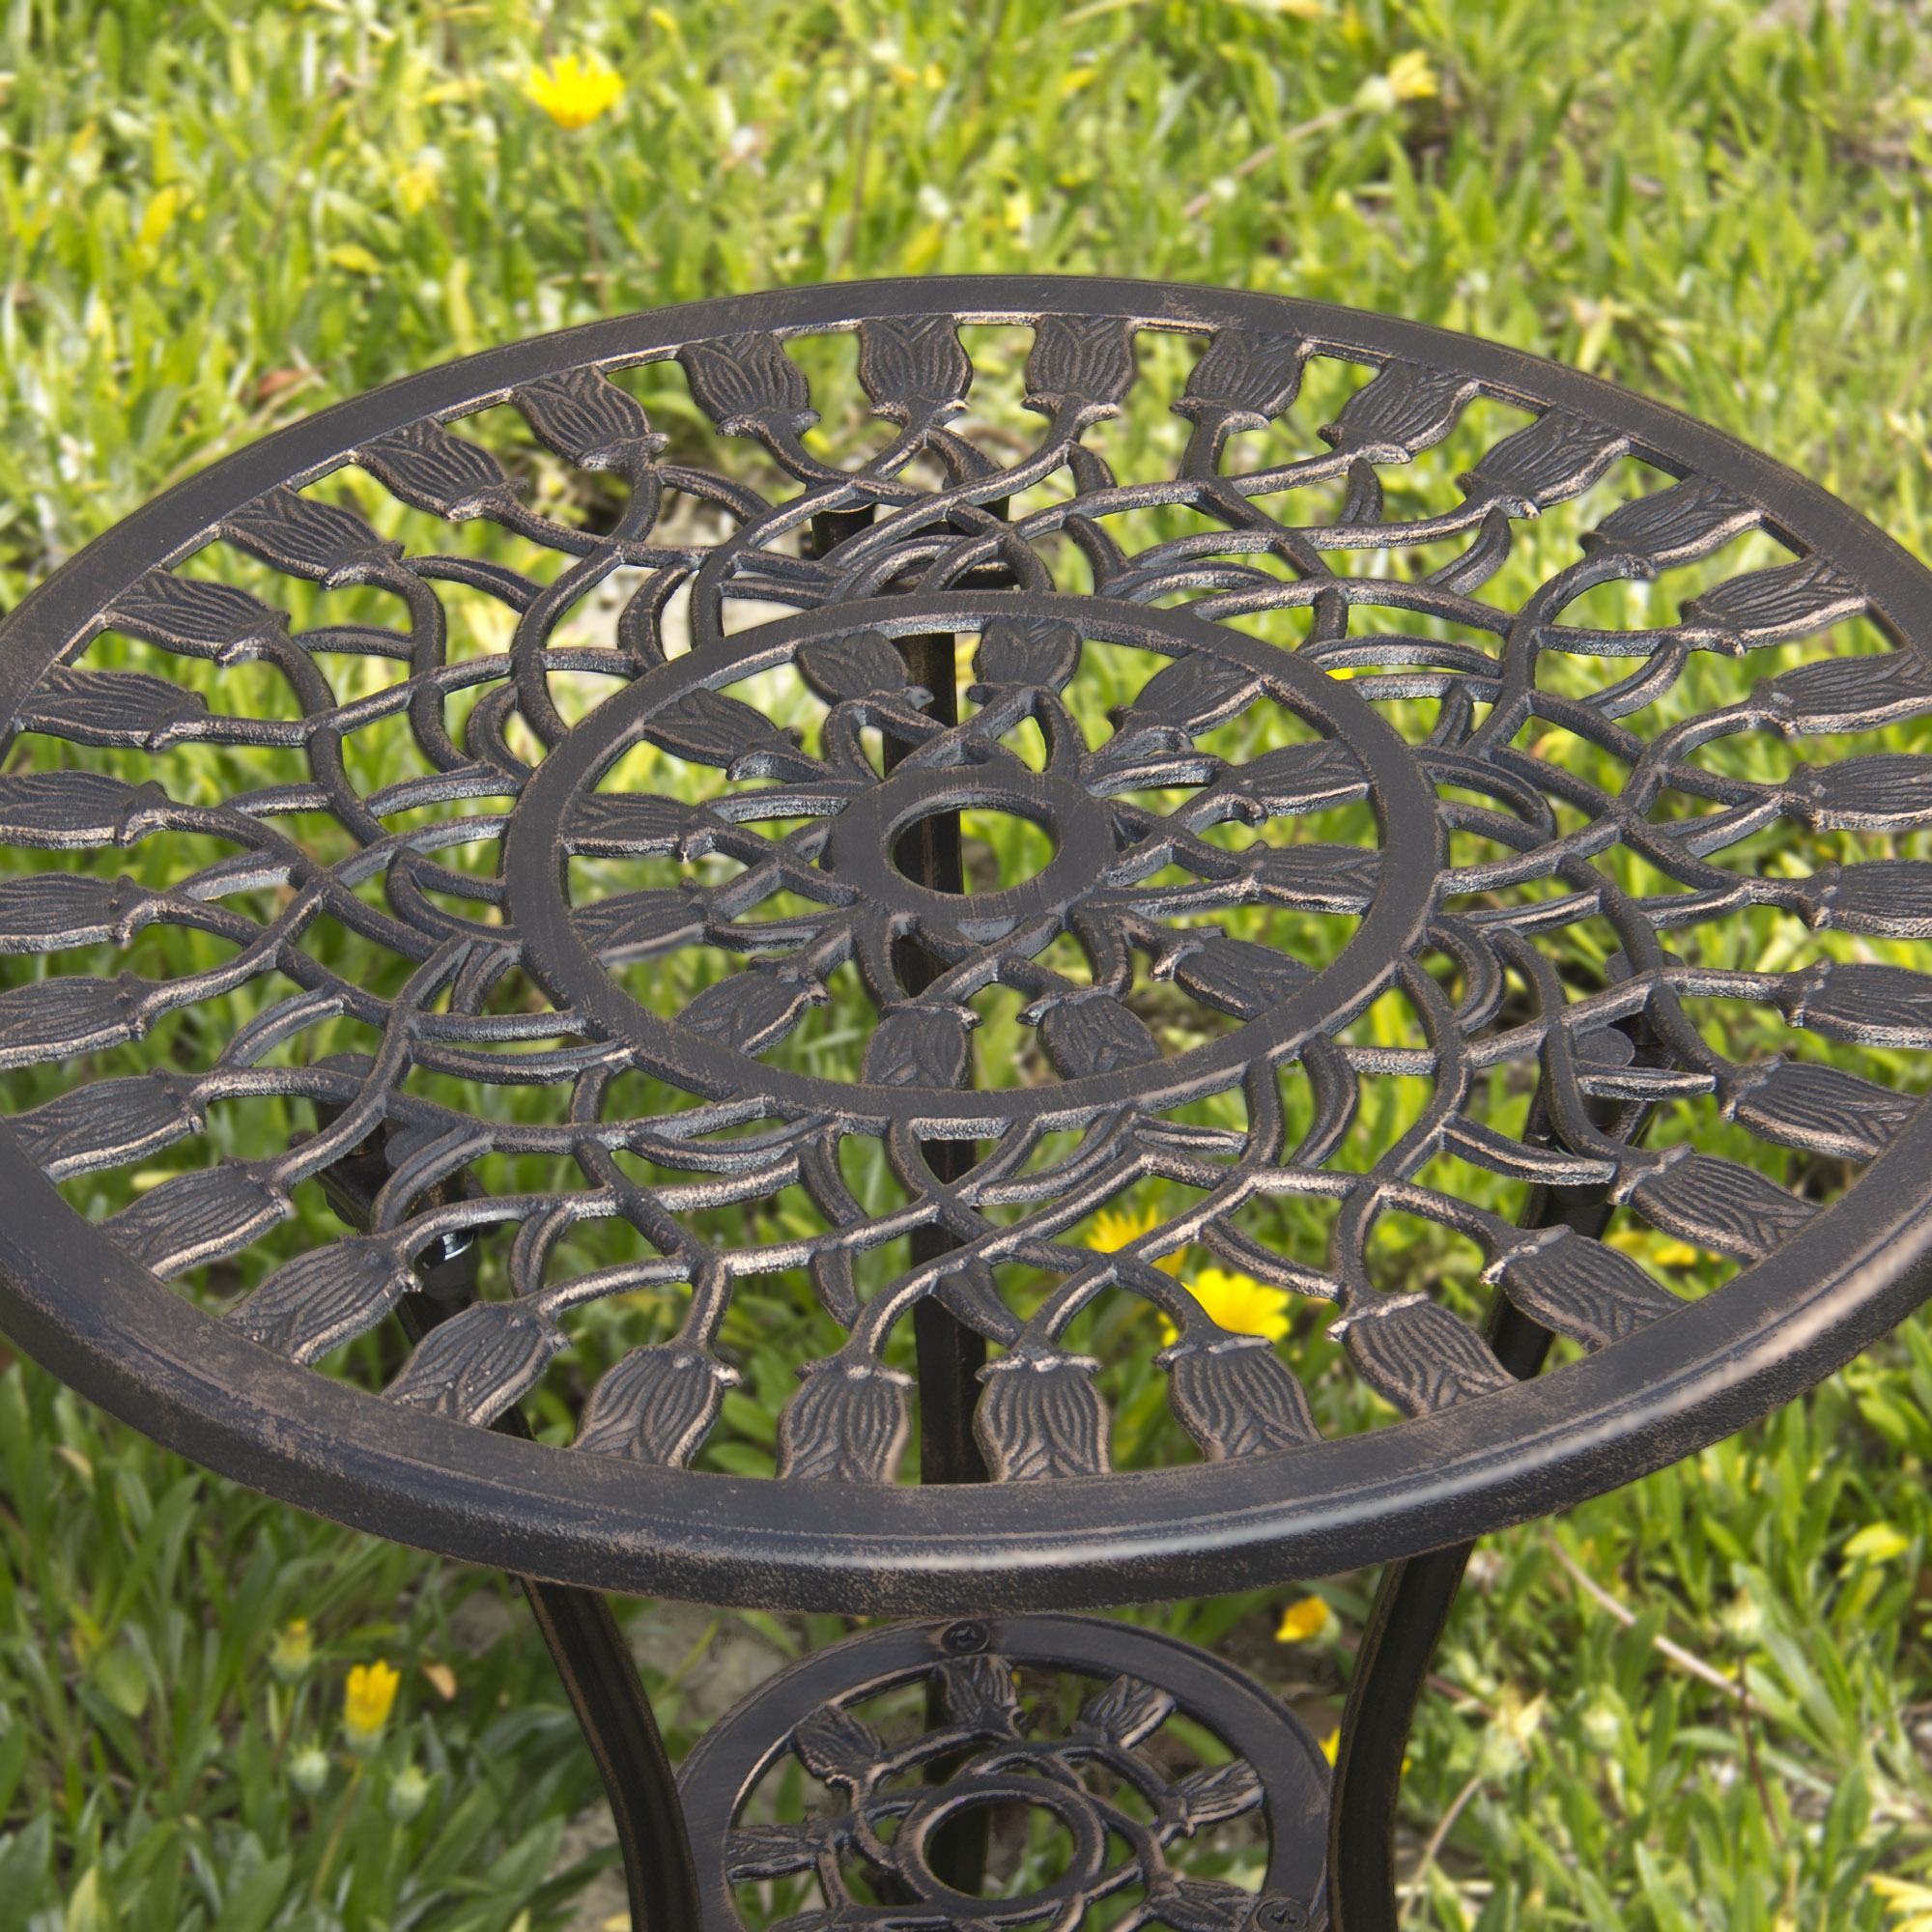 Best Choice Products Cast Aluminum Patio Bistro Furniture Set In Antique  Copper   Walmart.com